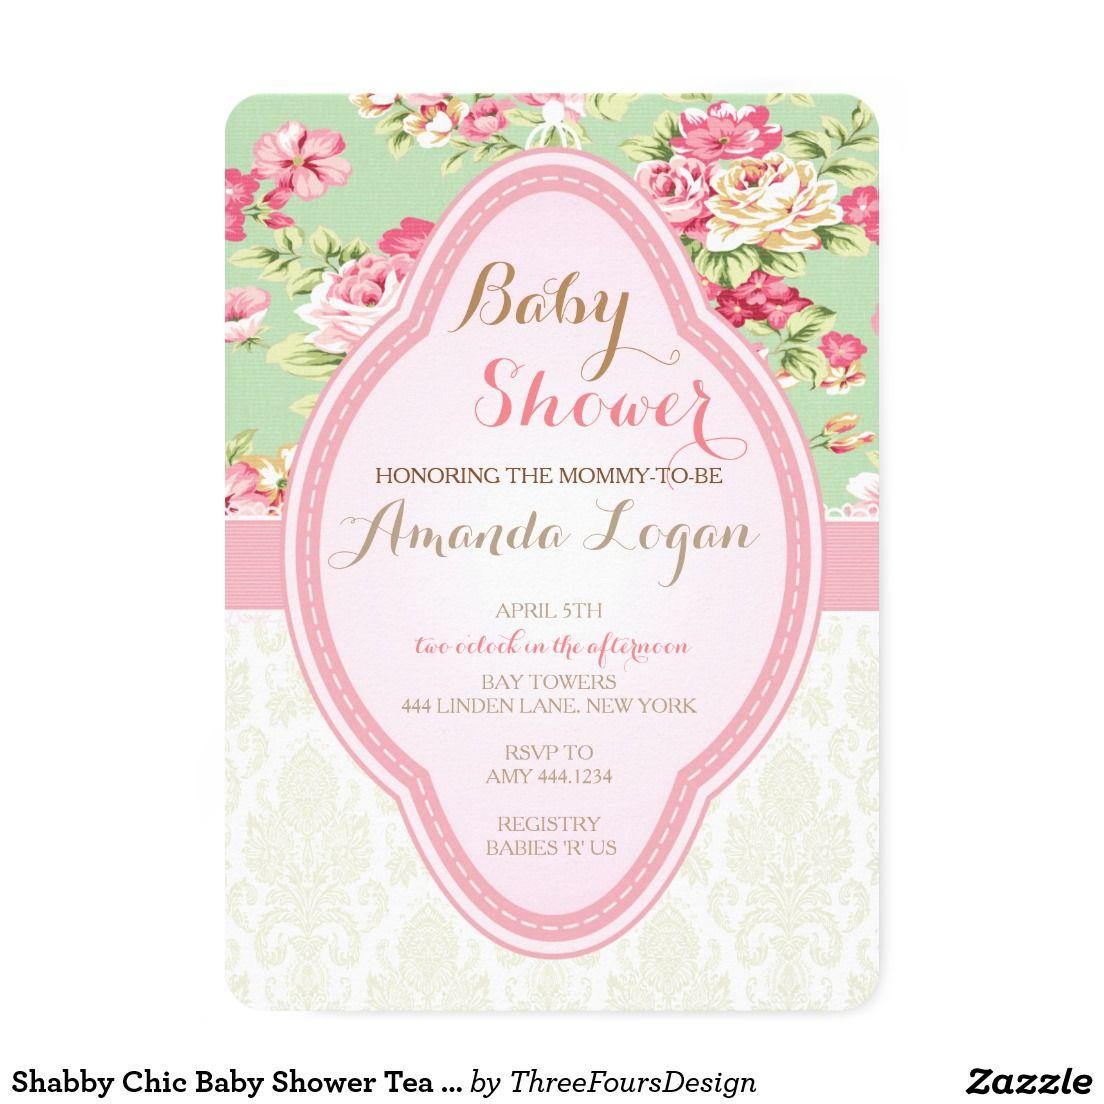 Shabby Chic Baby Shower Tea Party Invitations   WEDDING: BRIDAL ...